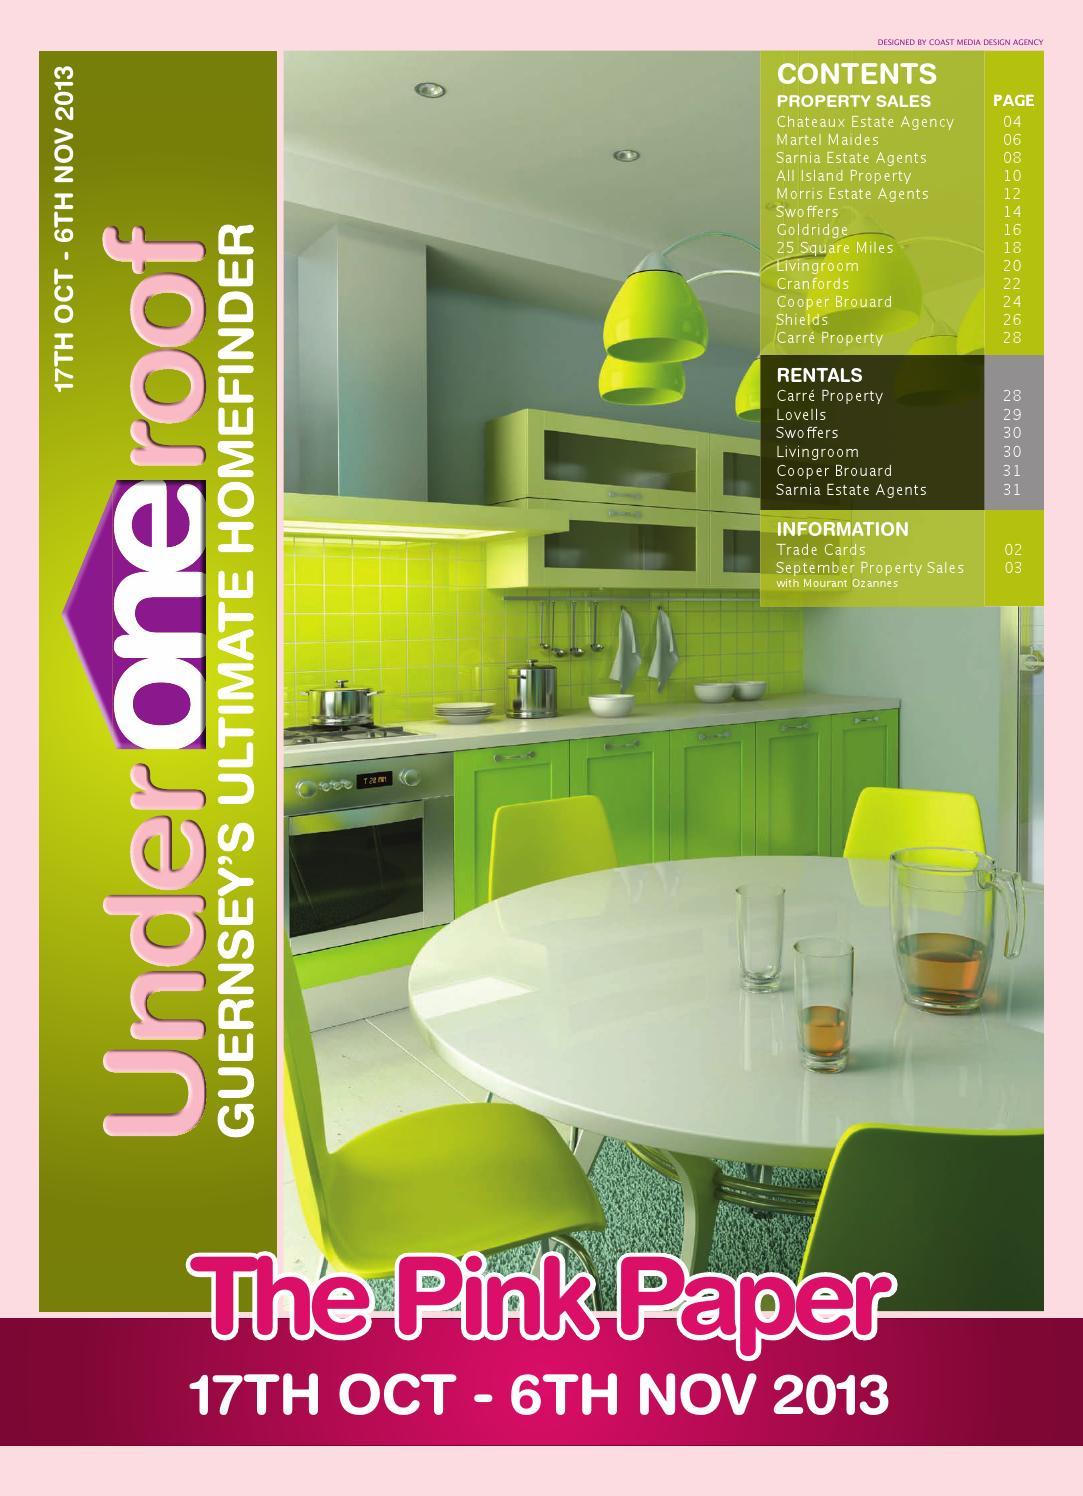 underoneroof 17th october 2013 issue by coast media issuu